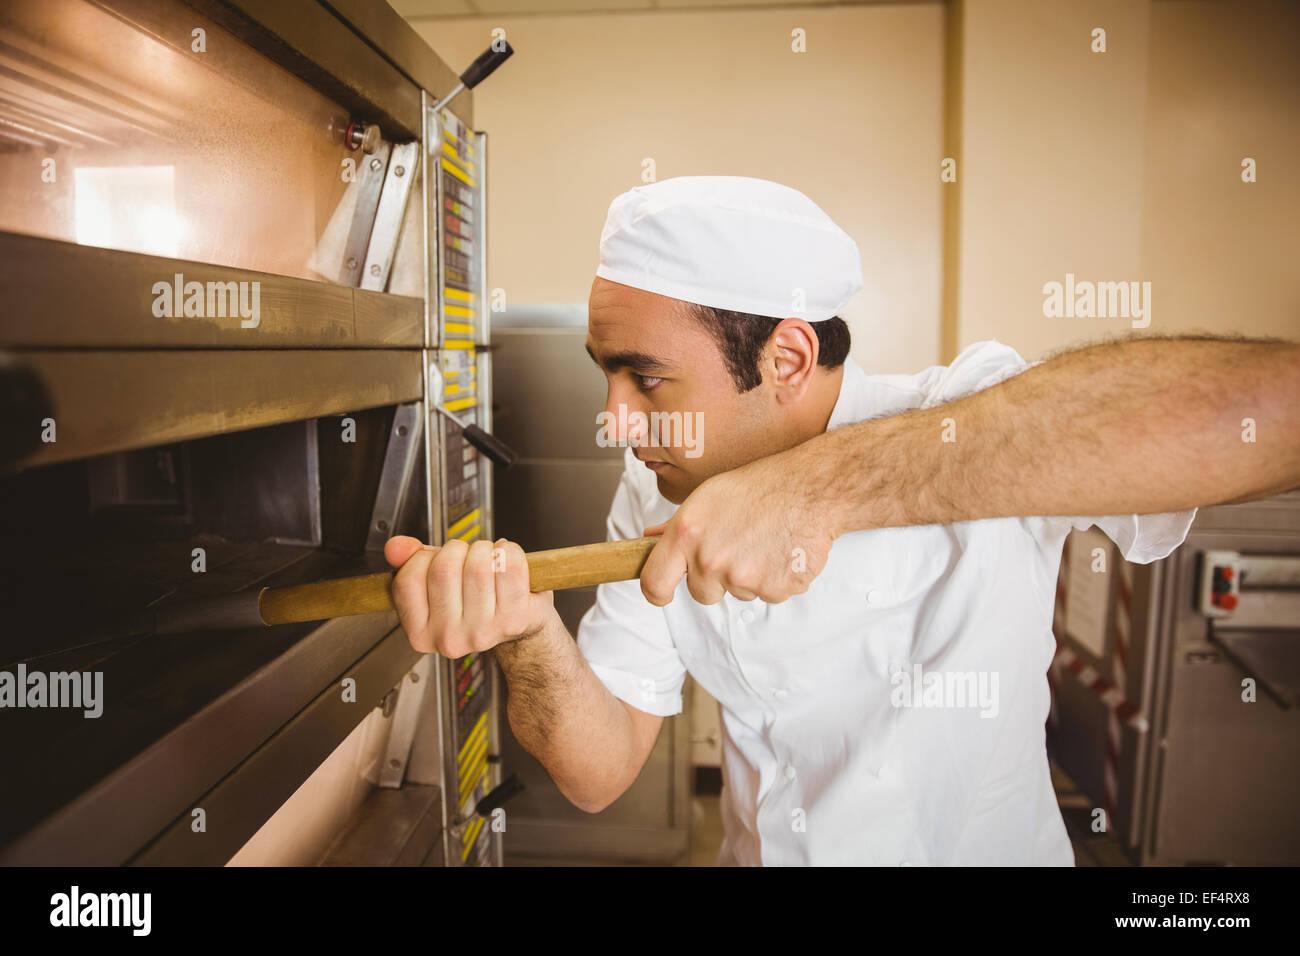 Bäcker Brot aus dem Ofen nehmen Stockbild